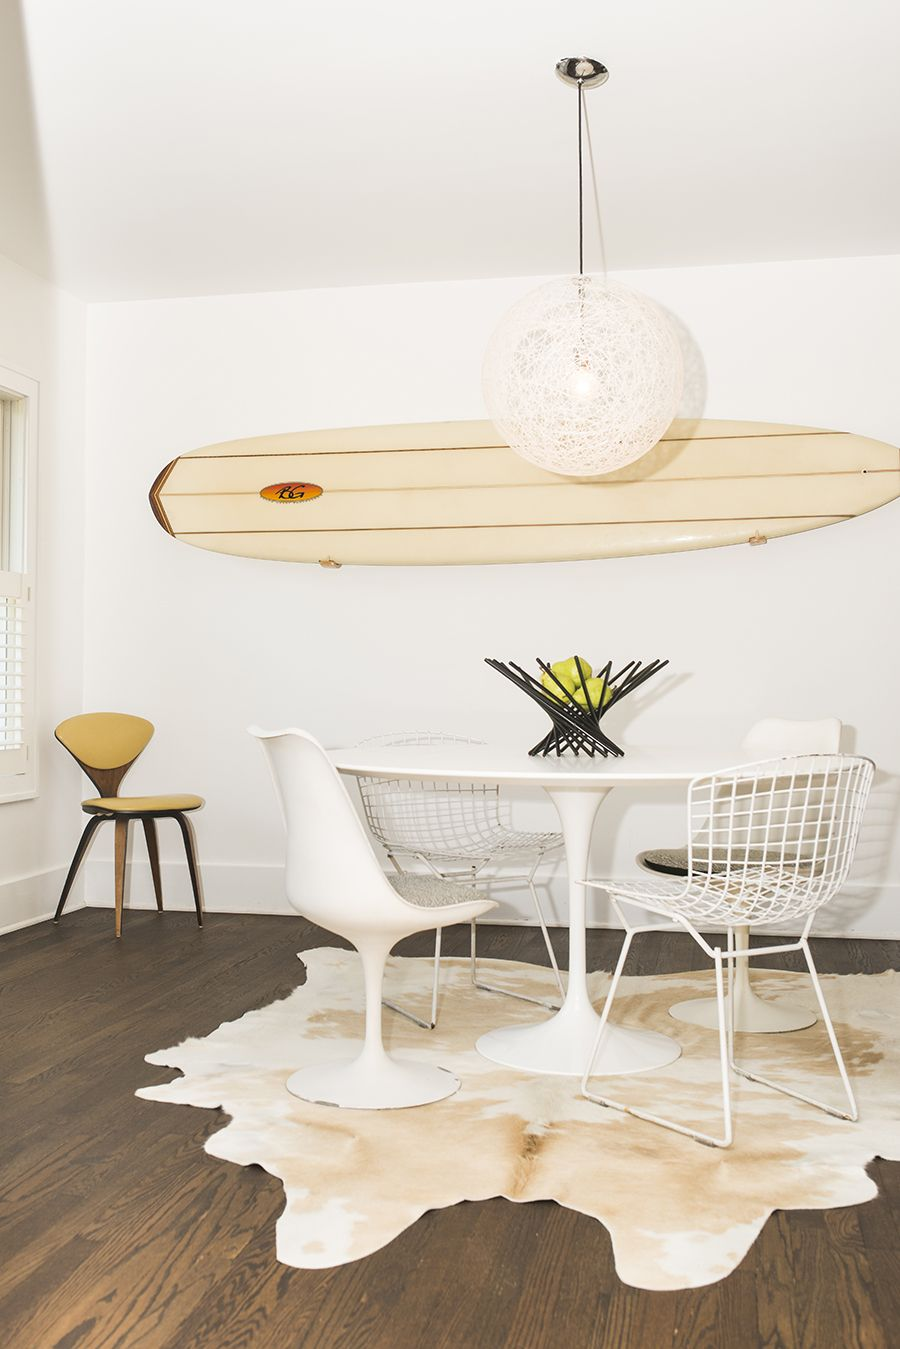 Cowhide Rug, Designer Eero Saarinen For Knoll Saarinen Round Dining Table,  Designer Eero Saarinen For Knoll Saarinen Armless Tulip Chairs, Designer  Harry ...